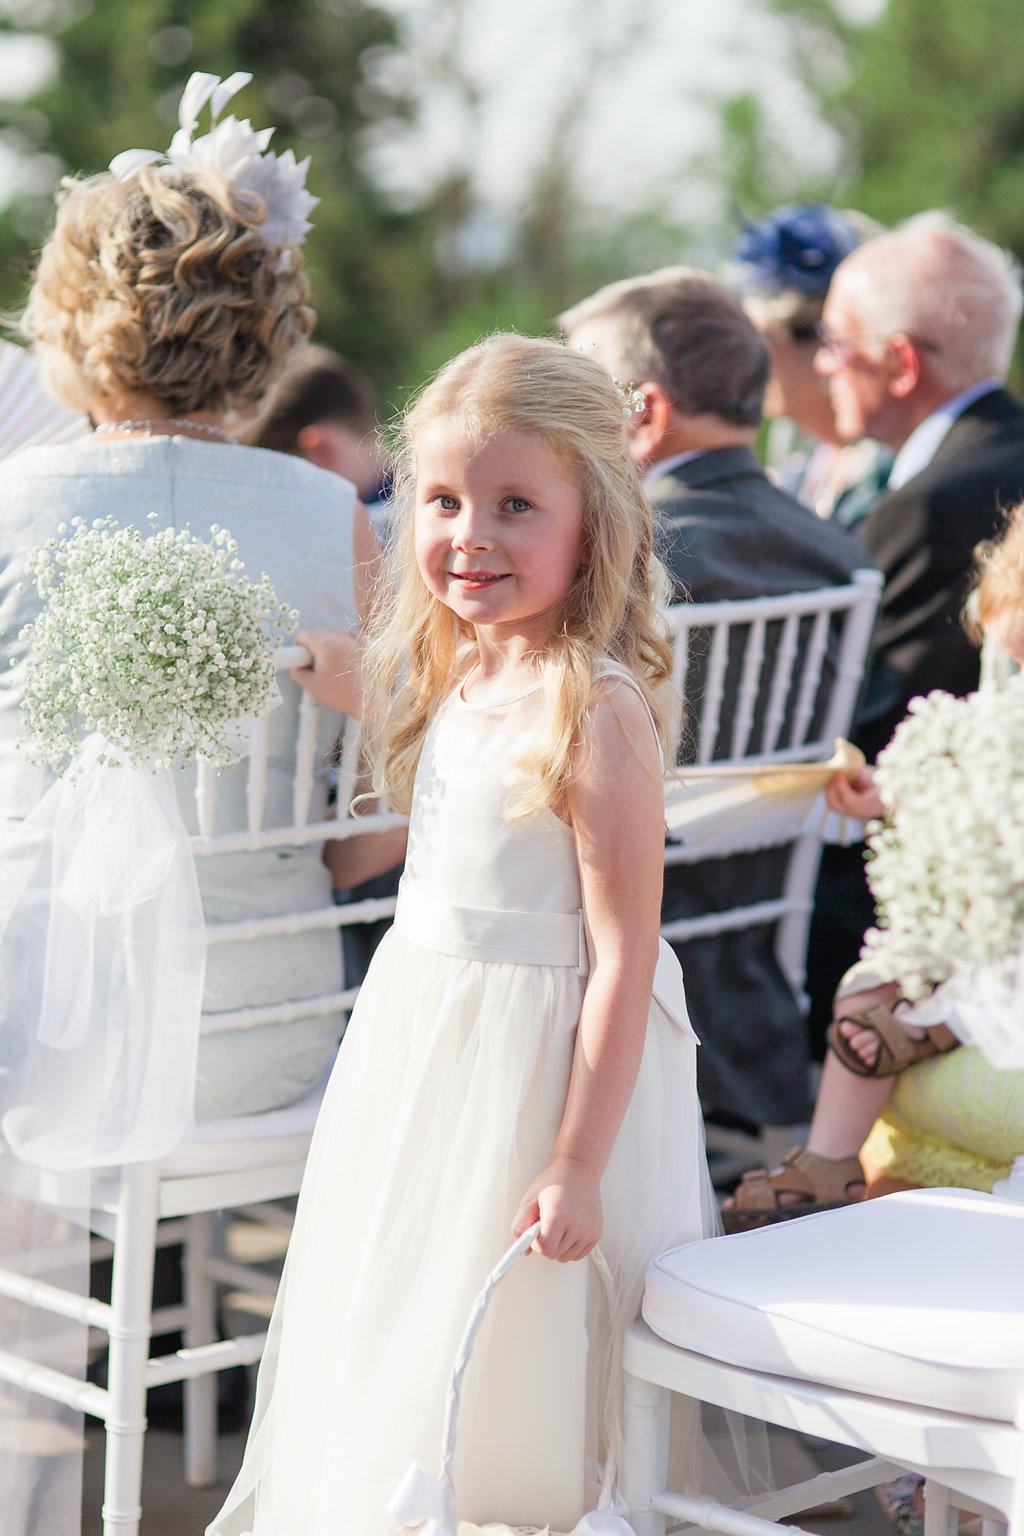 castelfalfi-tuscany-wedding-photographer-roberta-facchini-236